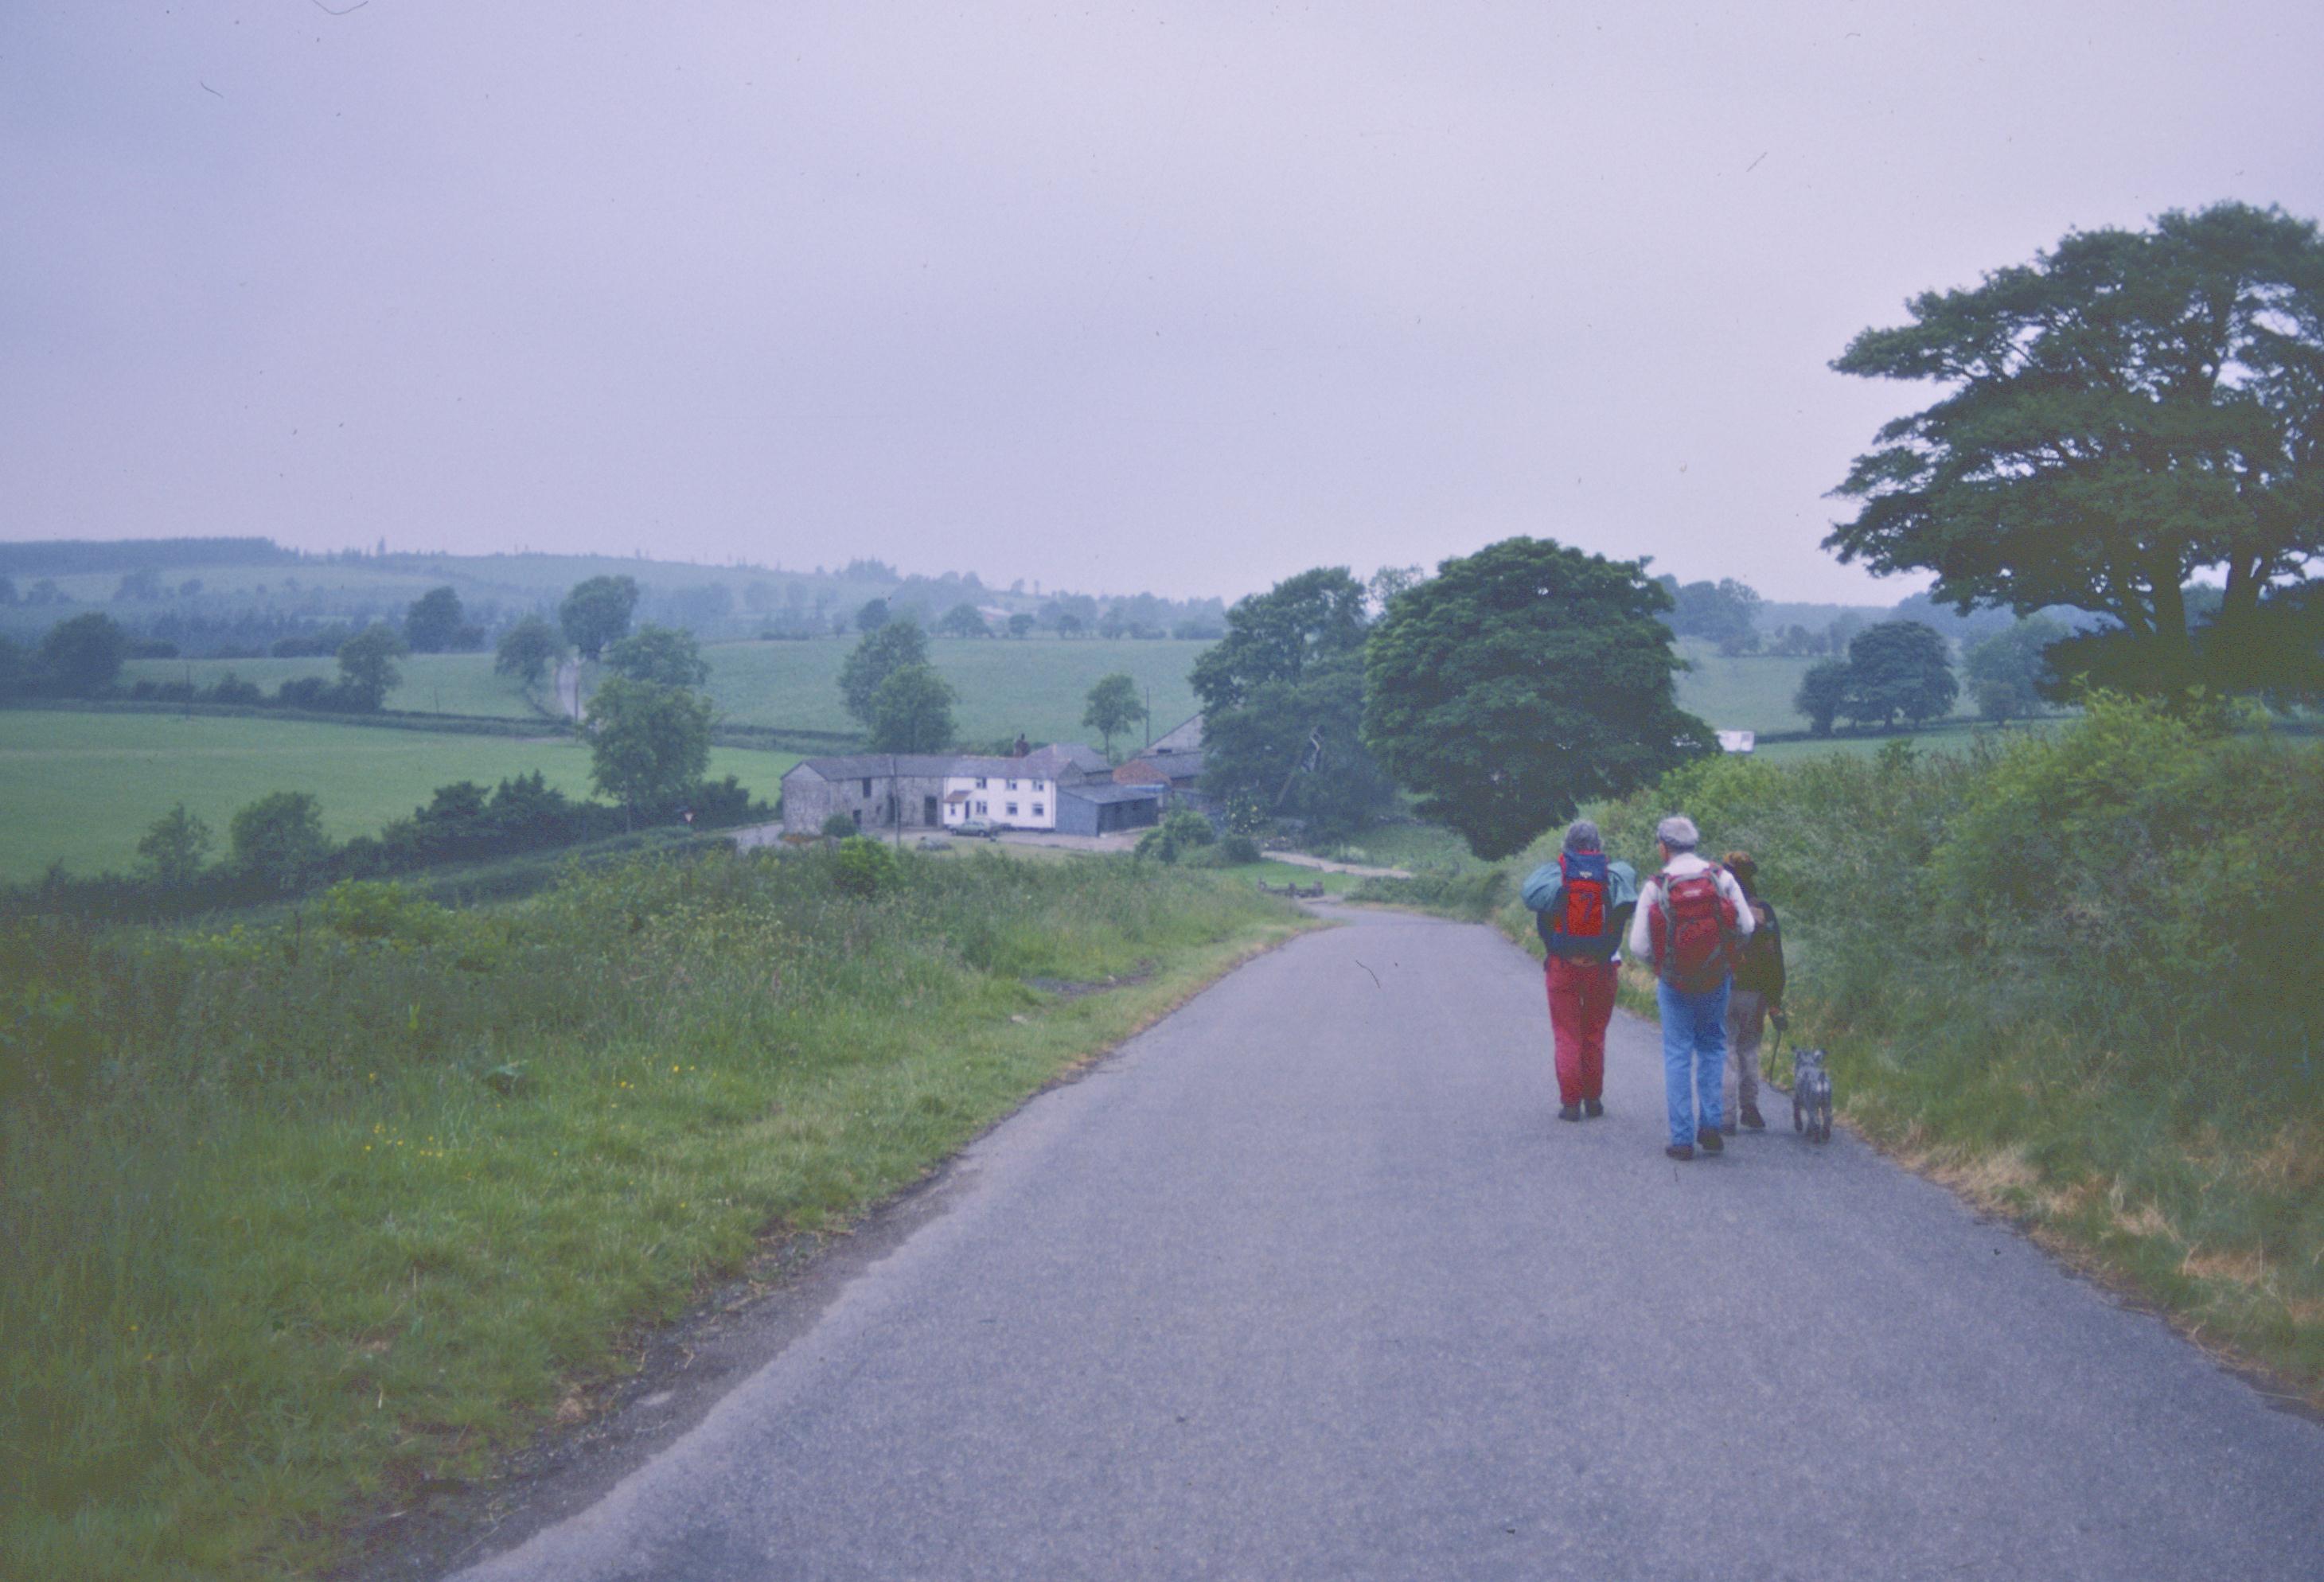 The road to Carreg-y-big